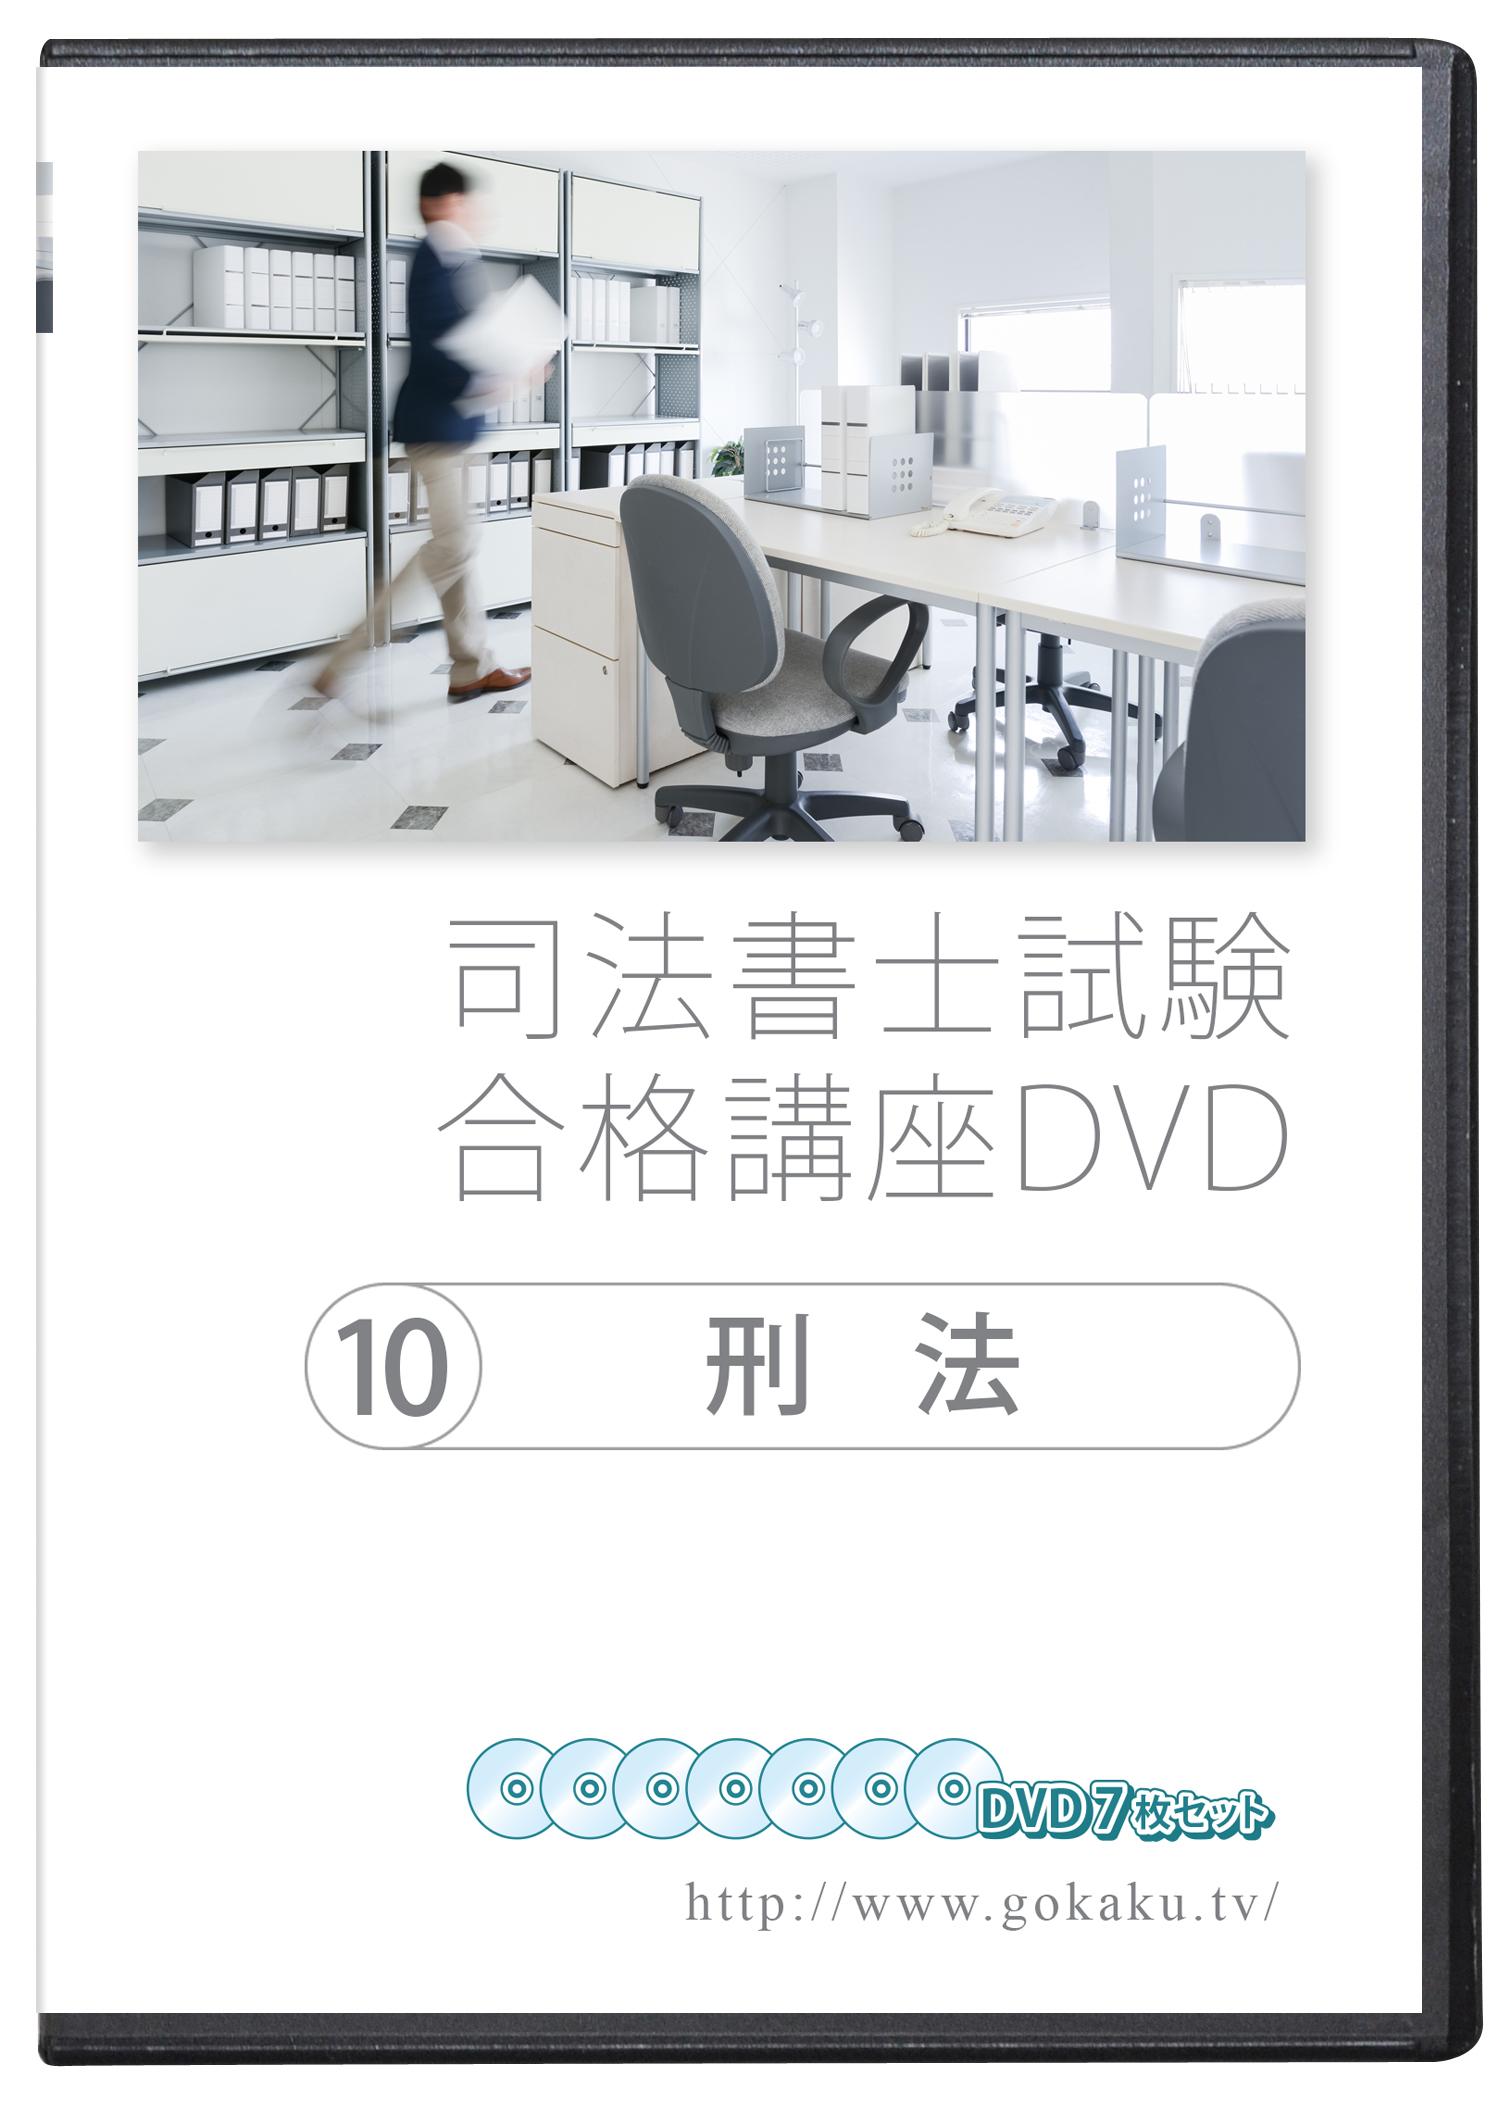 予約販売品 2021-2022年 司法書士試験合格講座DVD 新作多数 10刑法 PDF テキスト付き DVD7枚セット